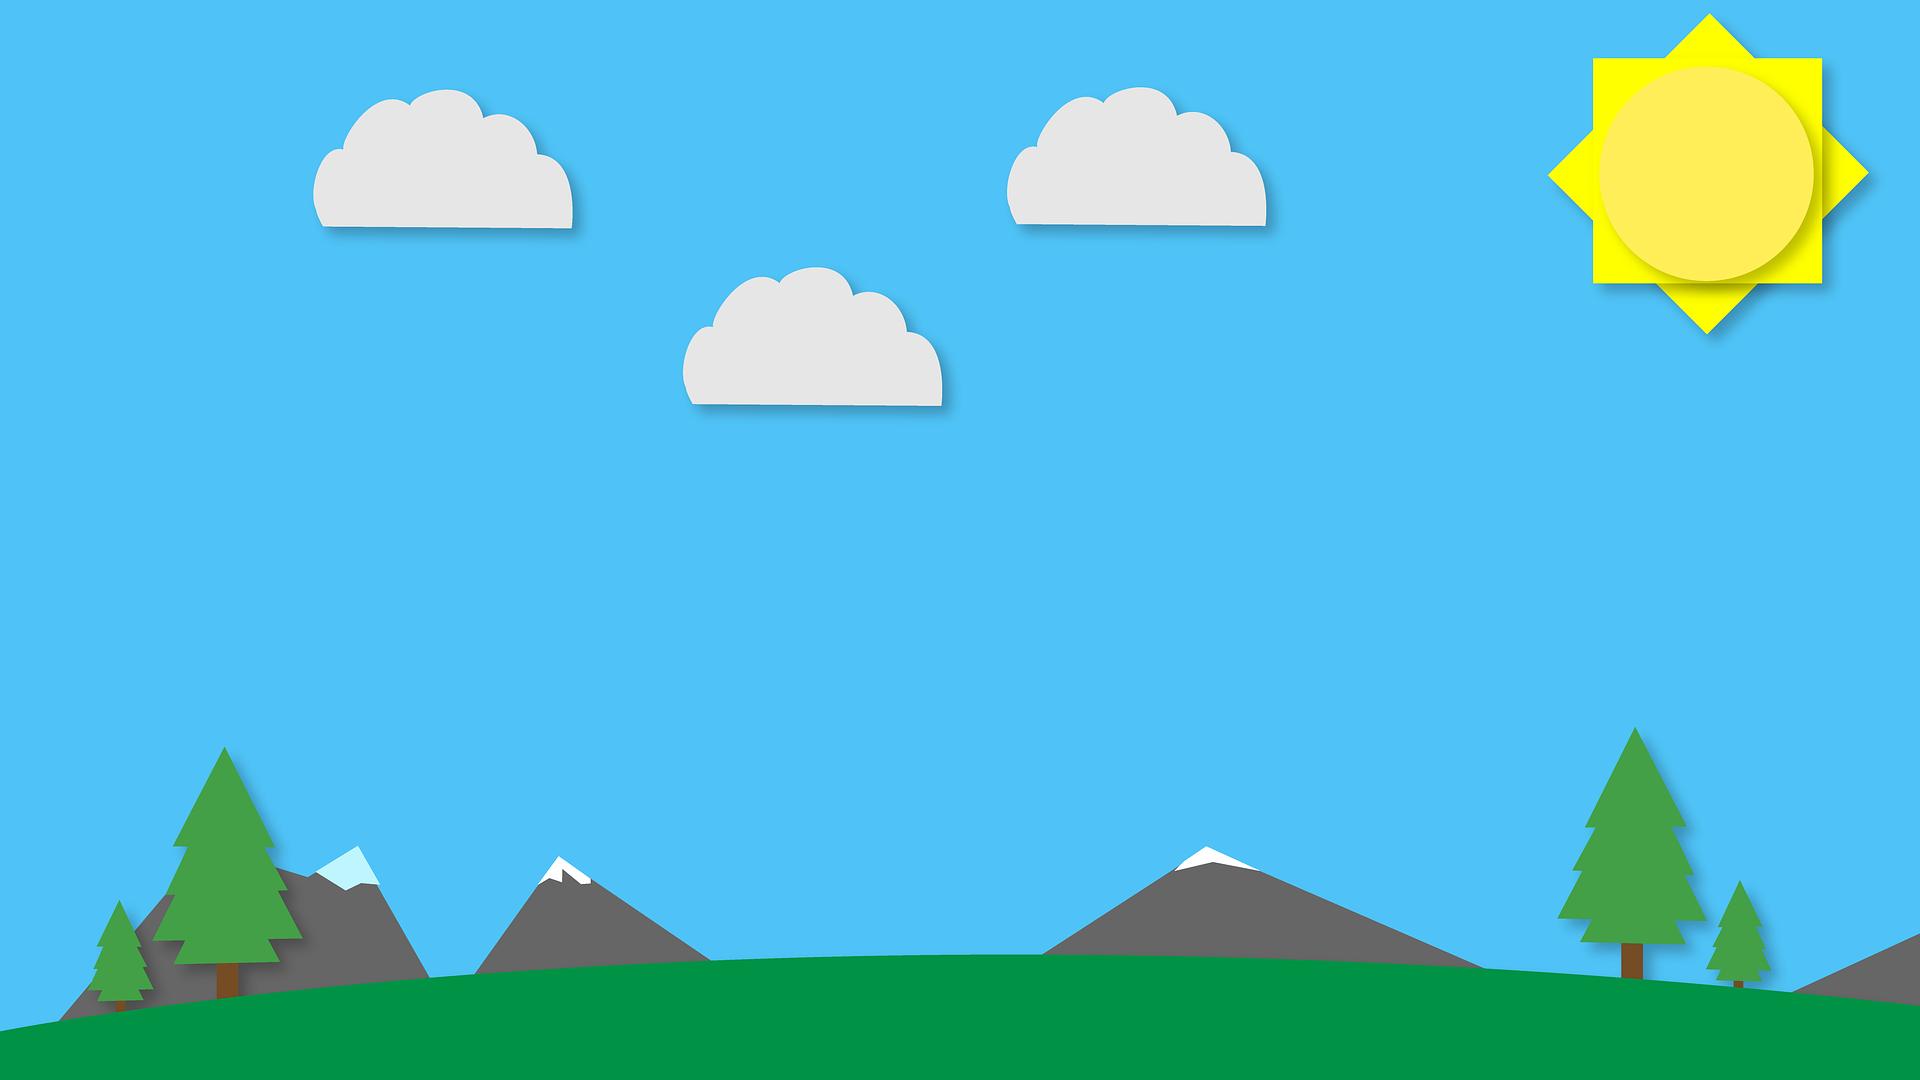 diseño plano, 平面设计, 景观, 云彩, 太阳, 山脉, 插图 - 高清壁纸 - 教授-falken.com